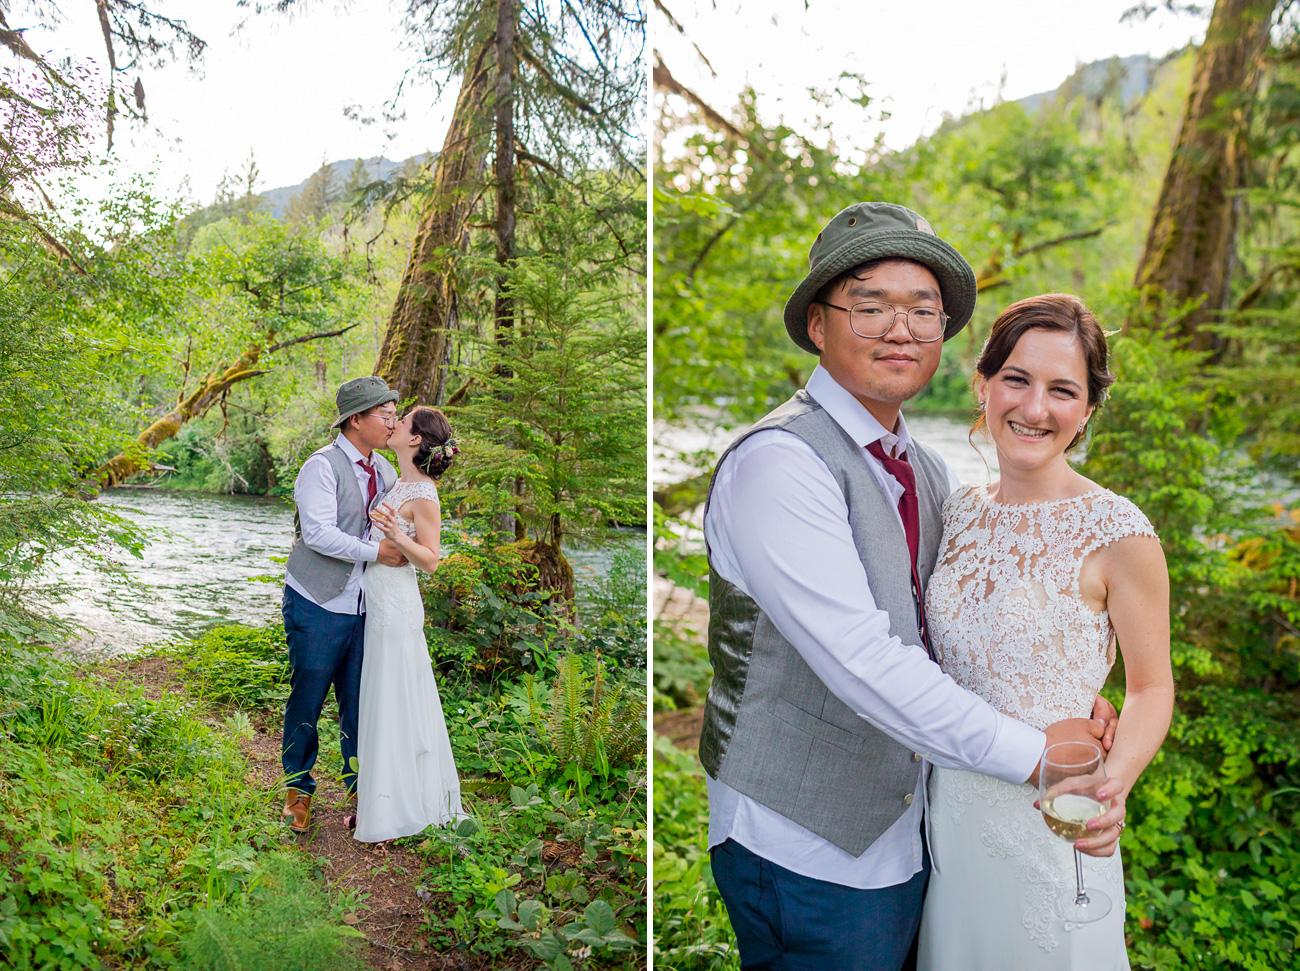 loloma-lodge-oregon-wedding-02 Loloma Lodge Oregon Wedding | Anna & Justin | Traditional Korean Tea Ceremony